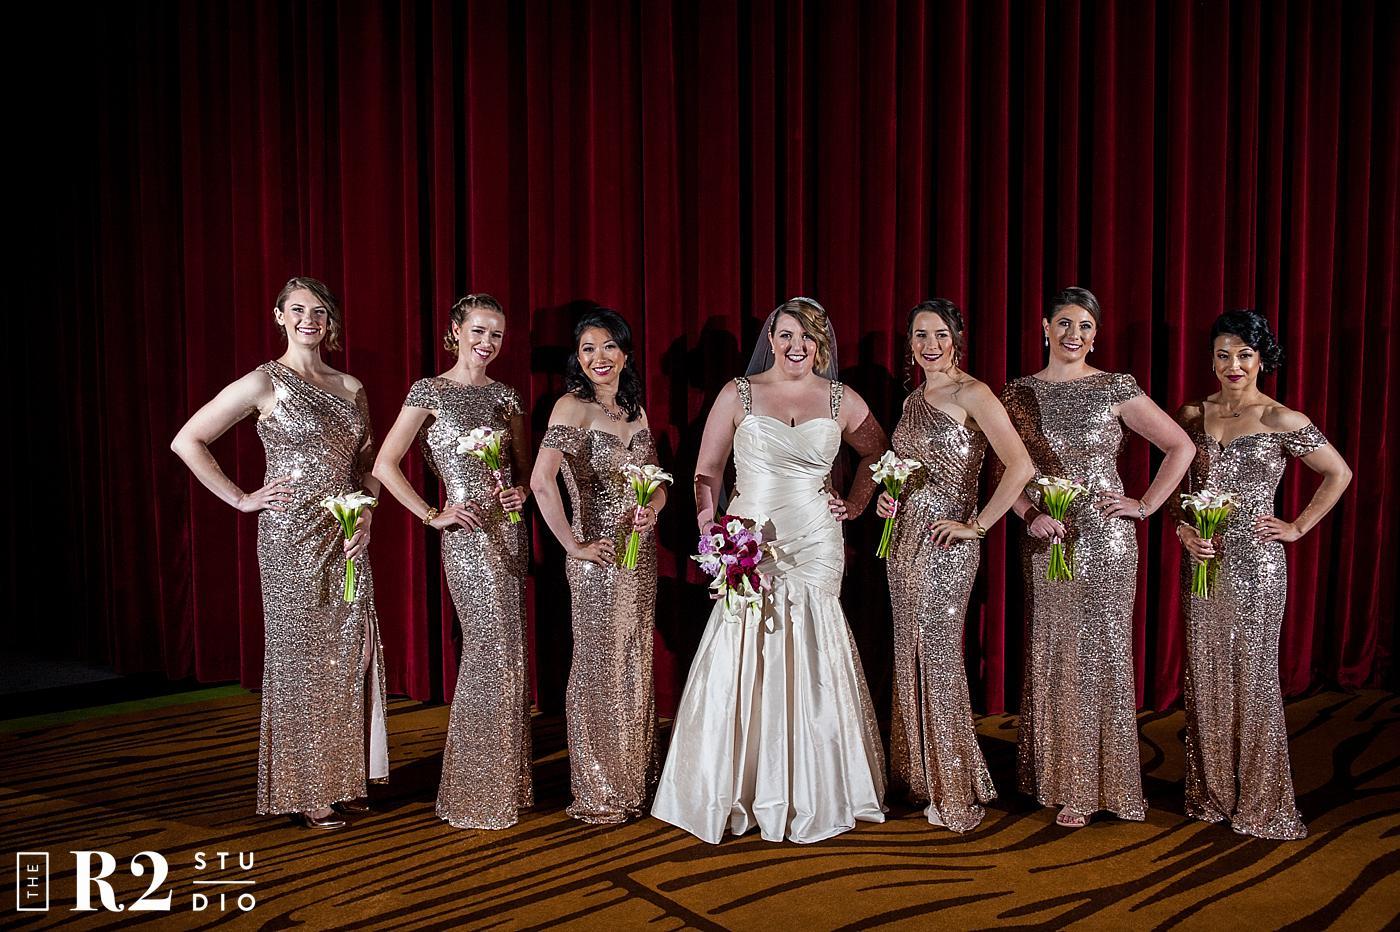 #slslasvegaswedding #slslasvegas #bridesmaid #bridalparty #weddingflowers #bridalbouquets #desirableeventsbydesi, #weddingplannerlasvegas,#lasvegasweddingcoordinators,#weddingcoordinatorslasvegas,#weddingcoordinatorlasvegas,#lasvegasweddingplanner #desirableeventsbydesi #Tropicanawedding #wedding, #love, #lovewins, #samesexwedding, #gaywedding, #tropicana, #lasvegaswedding, #weddinglasvegas, #weddingplannerslasvegas, #lasvegasweddingplanners, # layersoflovely, #lasvegaswedding, #susieandwill, #rusticwedding, #wedding, #historic5thstreetschool, #downtownlasvegas, #sls, #sayersclub, #bazaarmeats, #slslv, #slslasvegas #slsweddings, #lasvegasweddings, #renttherunwaybridesmaids